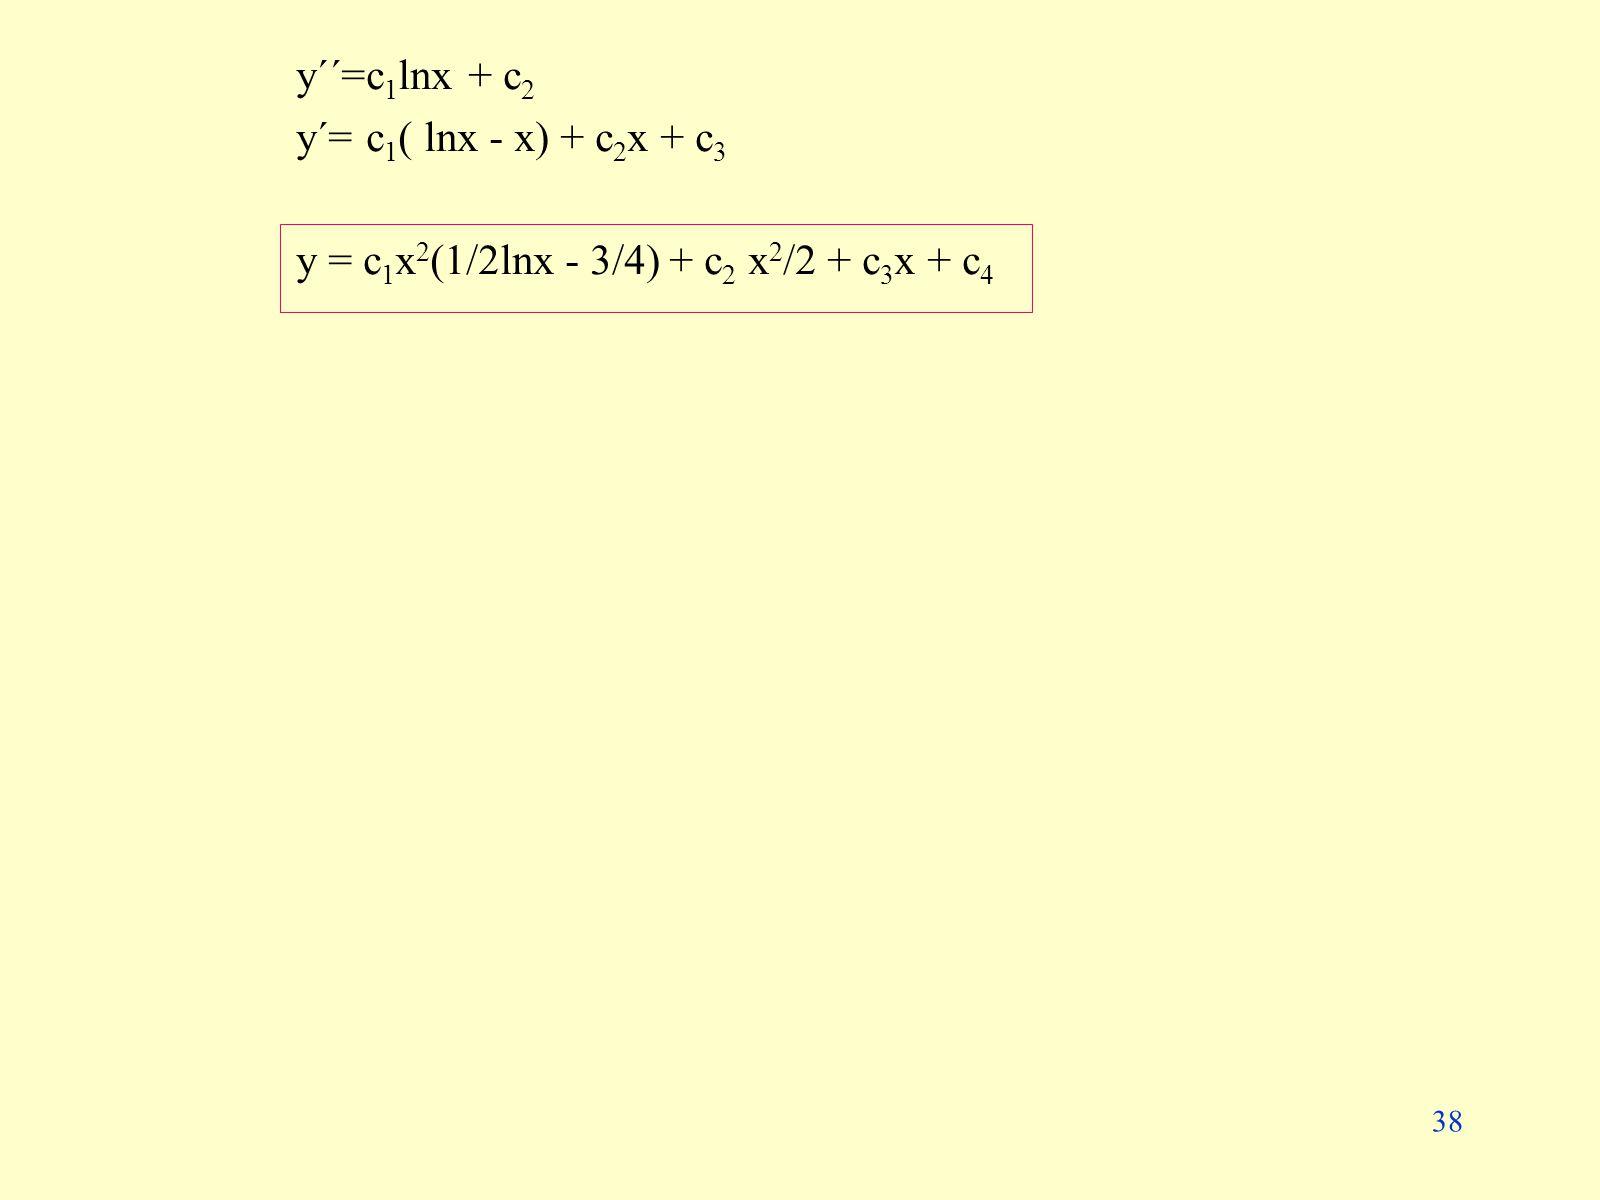 y´´=c1lnx + c2 y´= c1( lnx - x) + c2x + c3 y = c1x2(1/2lnx - 3/4) + c2 x2/2 + c3x + c4